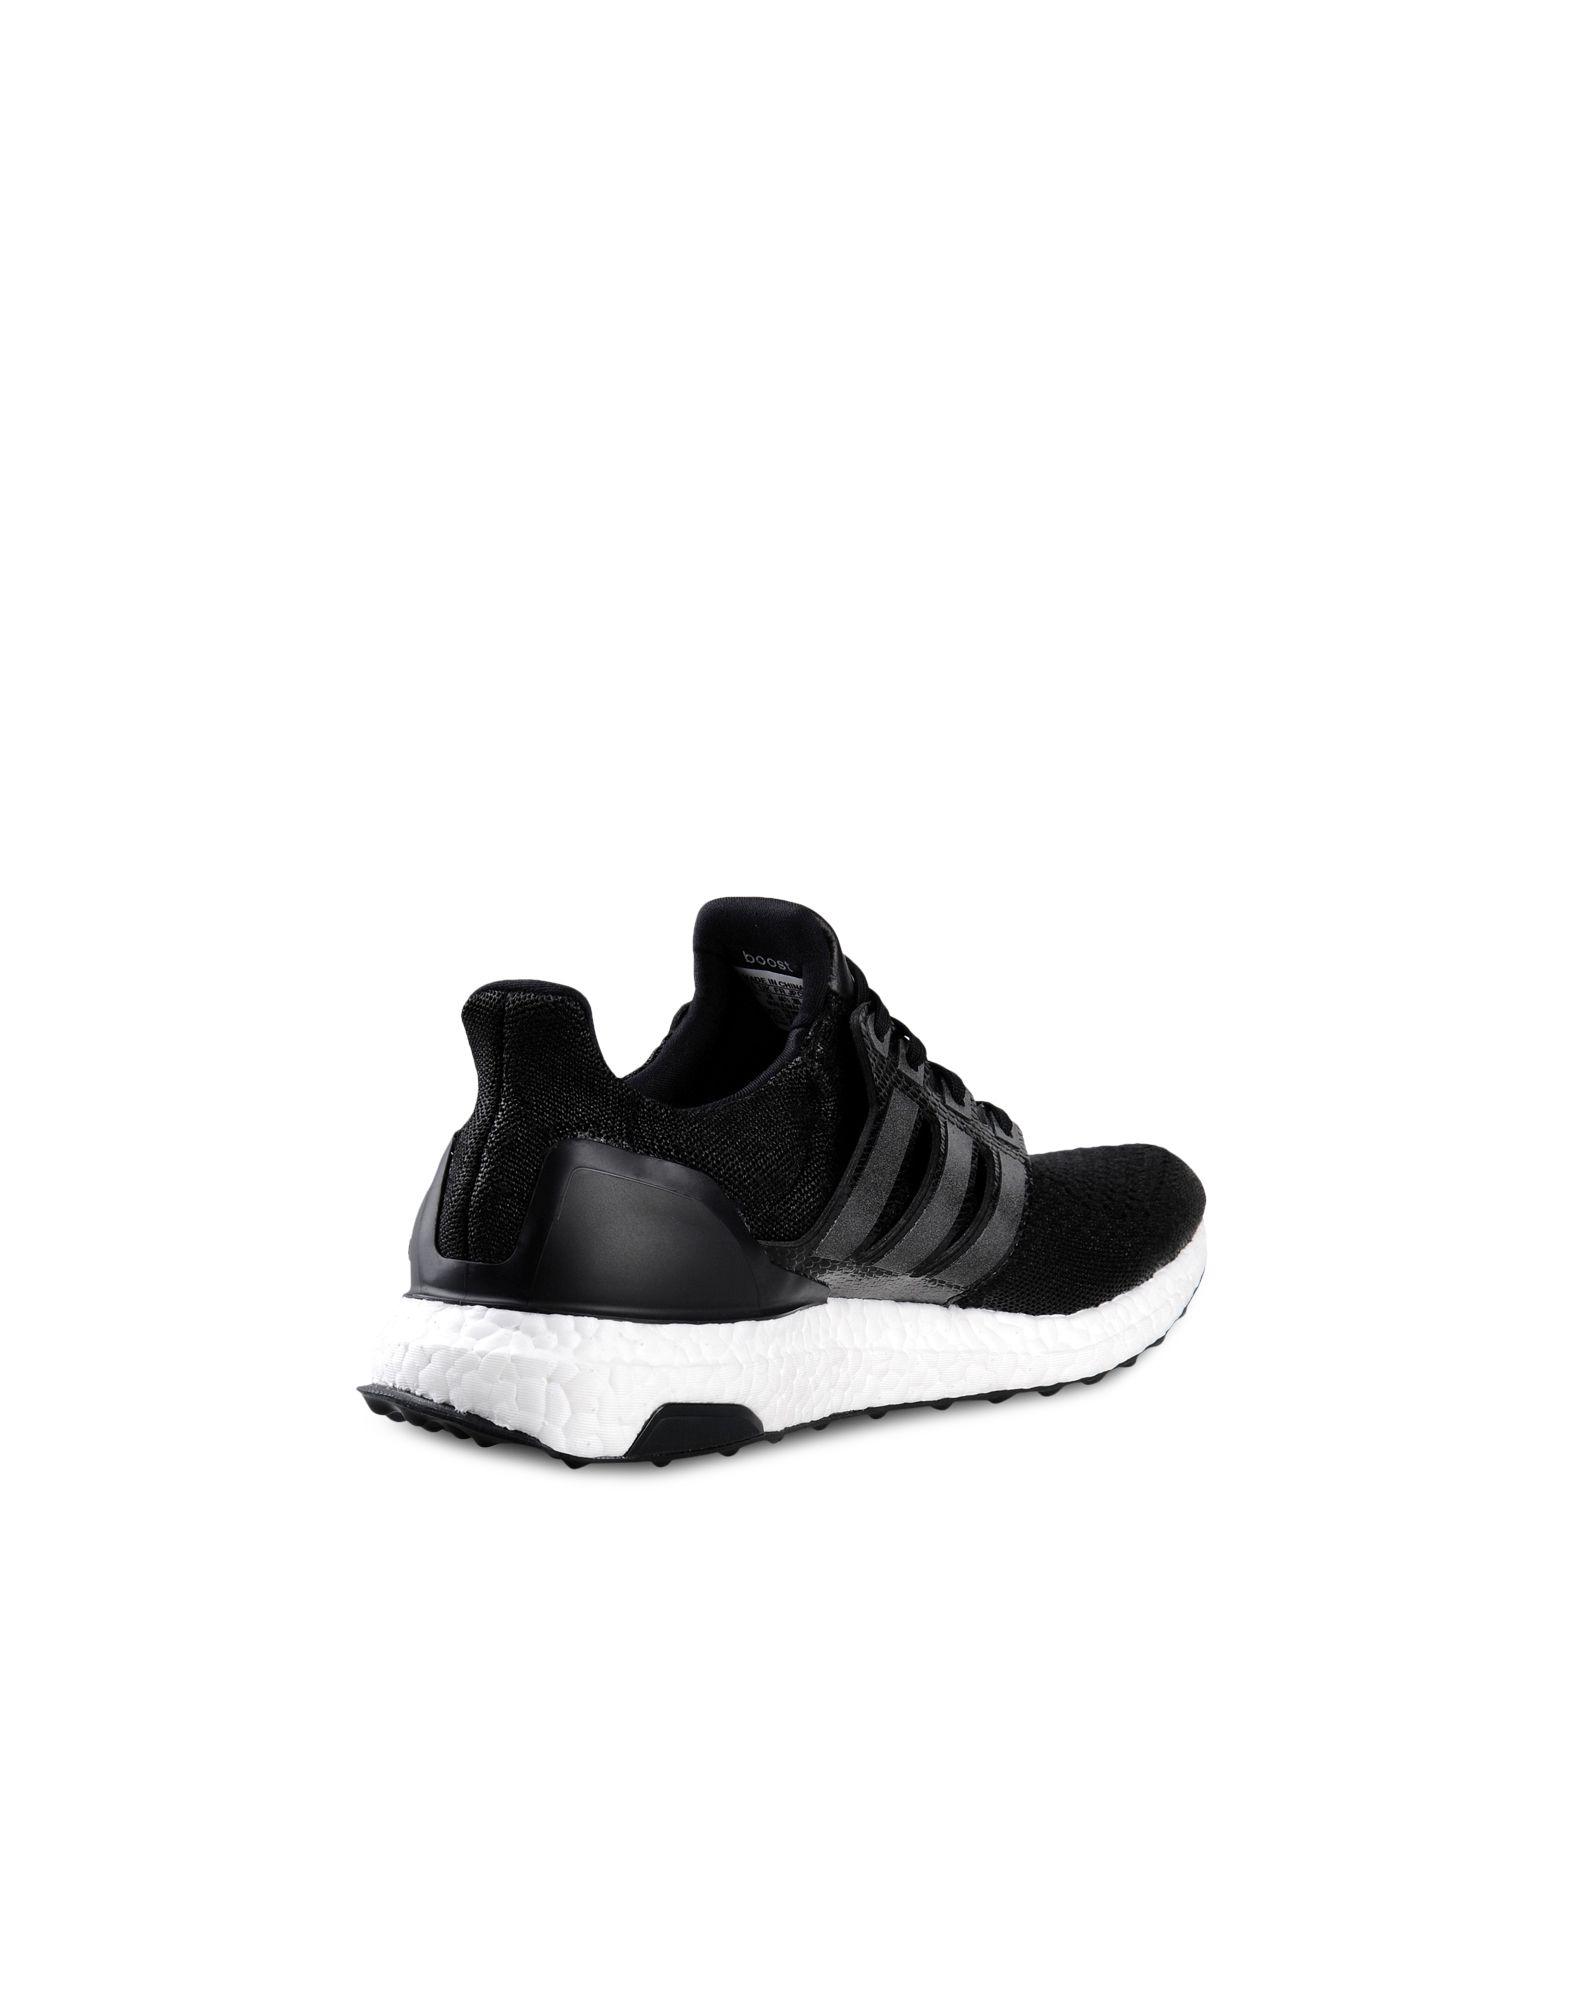 adidas dagli ultra - impulso j & d scarpe adidas y 3 negozio ufficiale